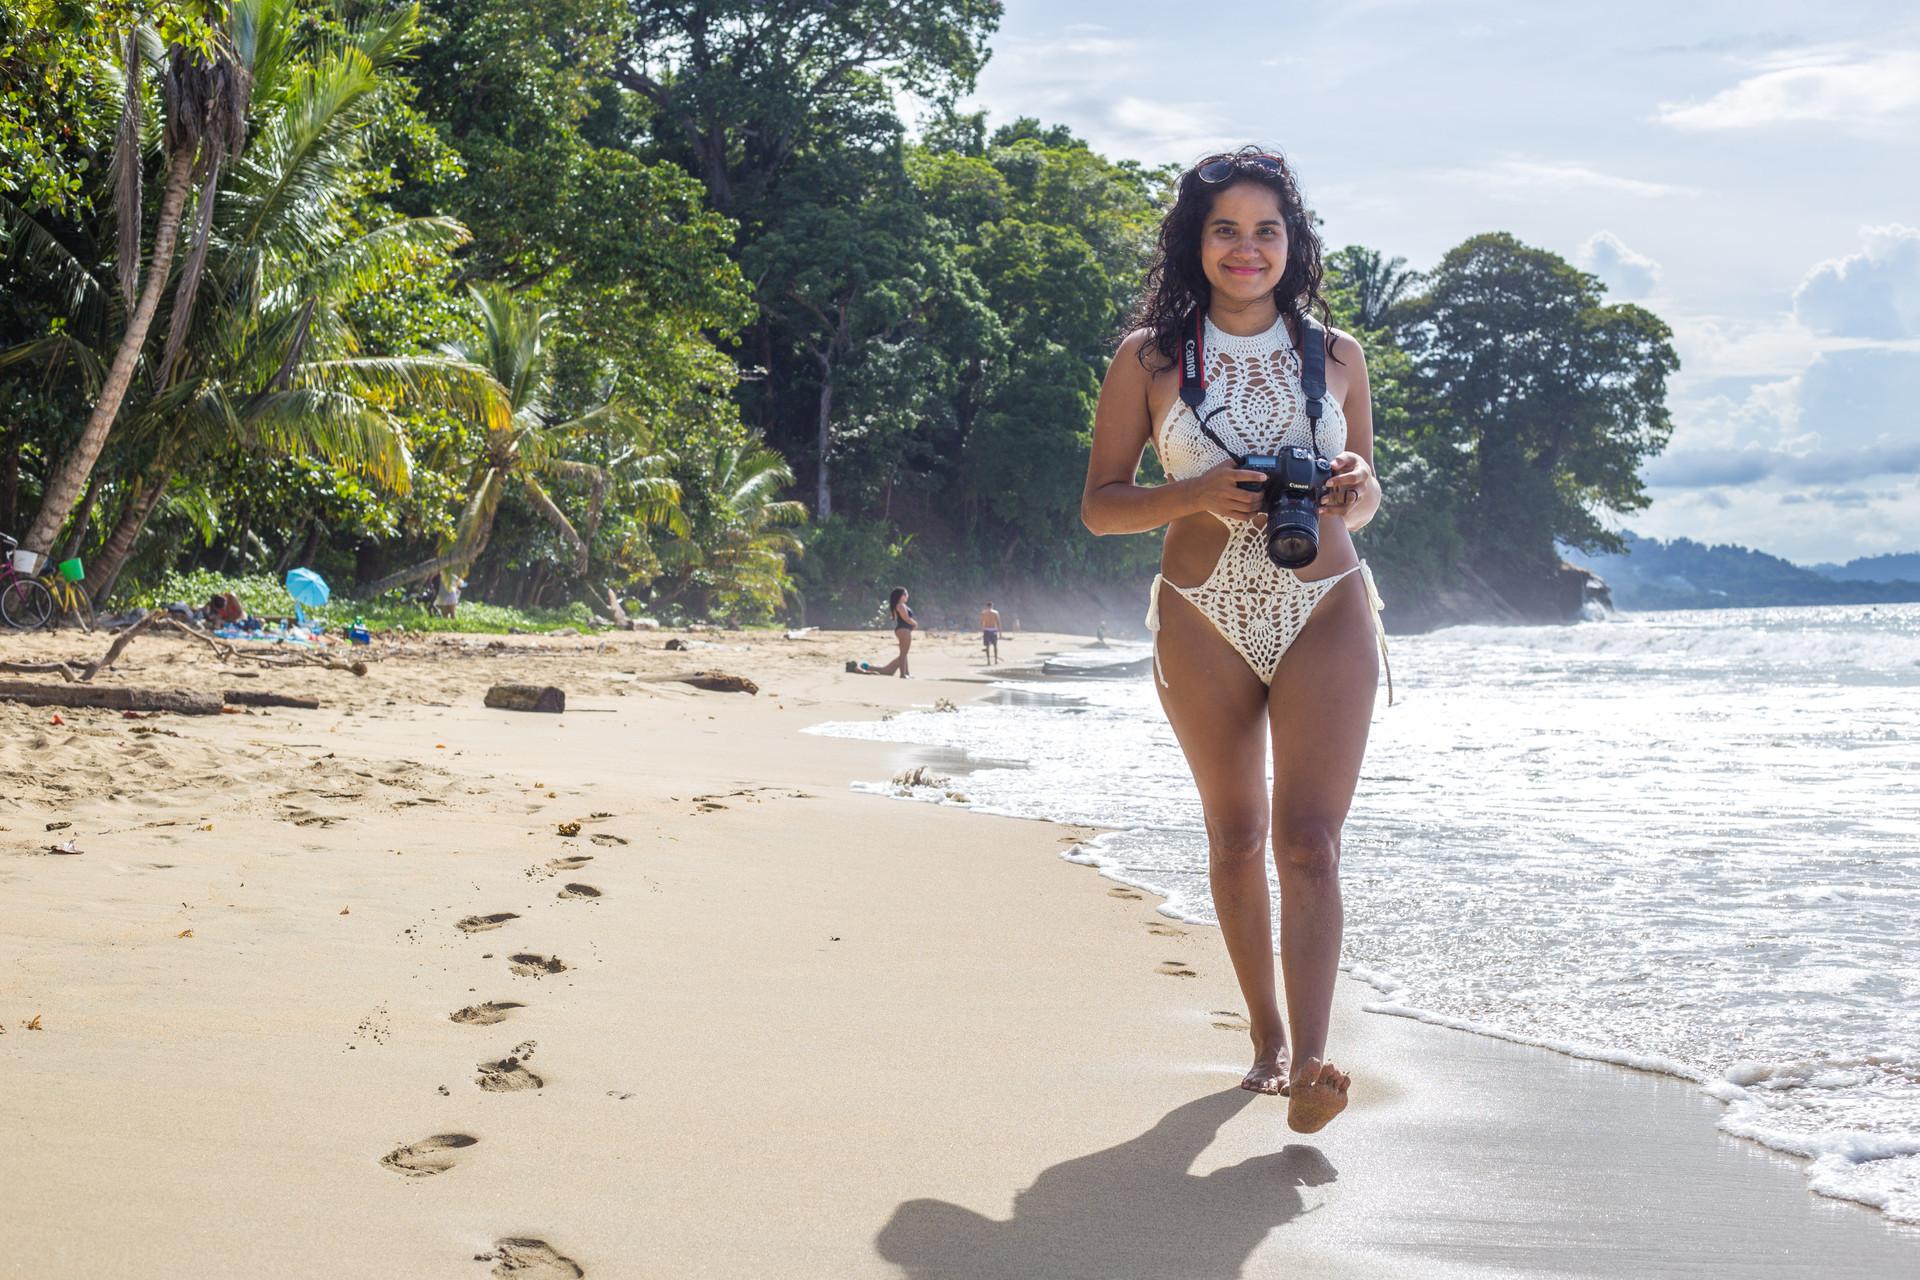 Beach Paparazzi